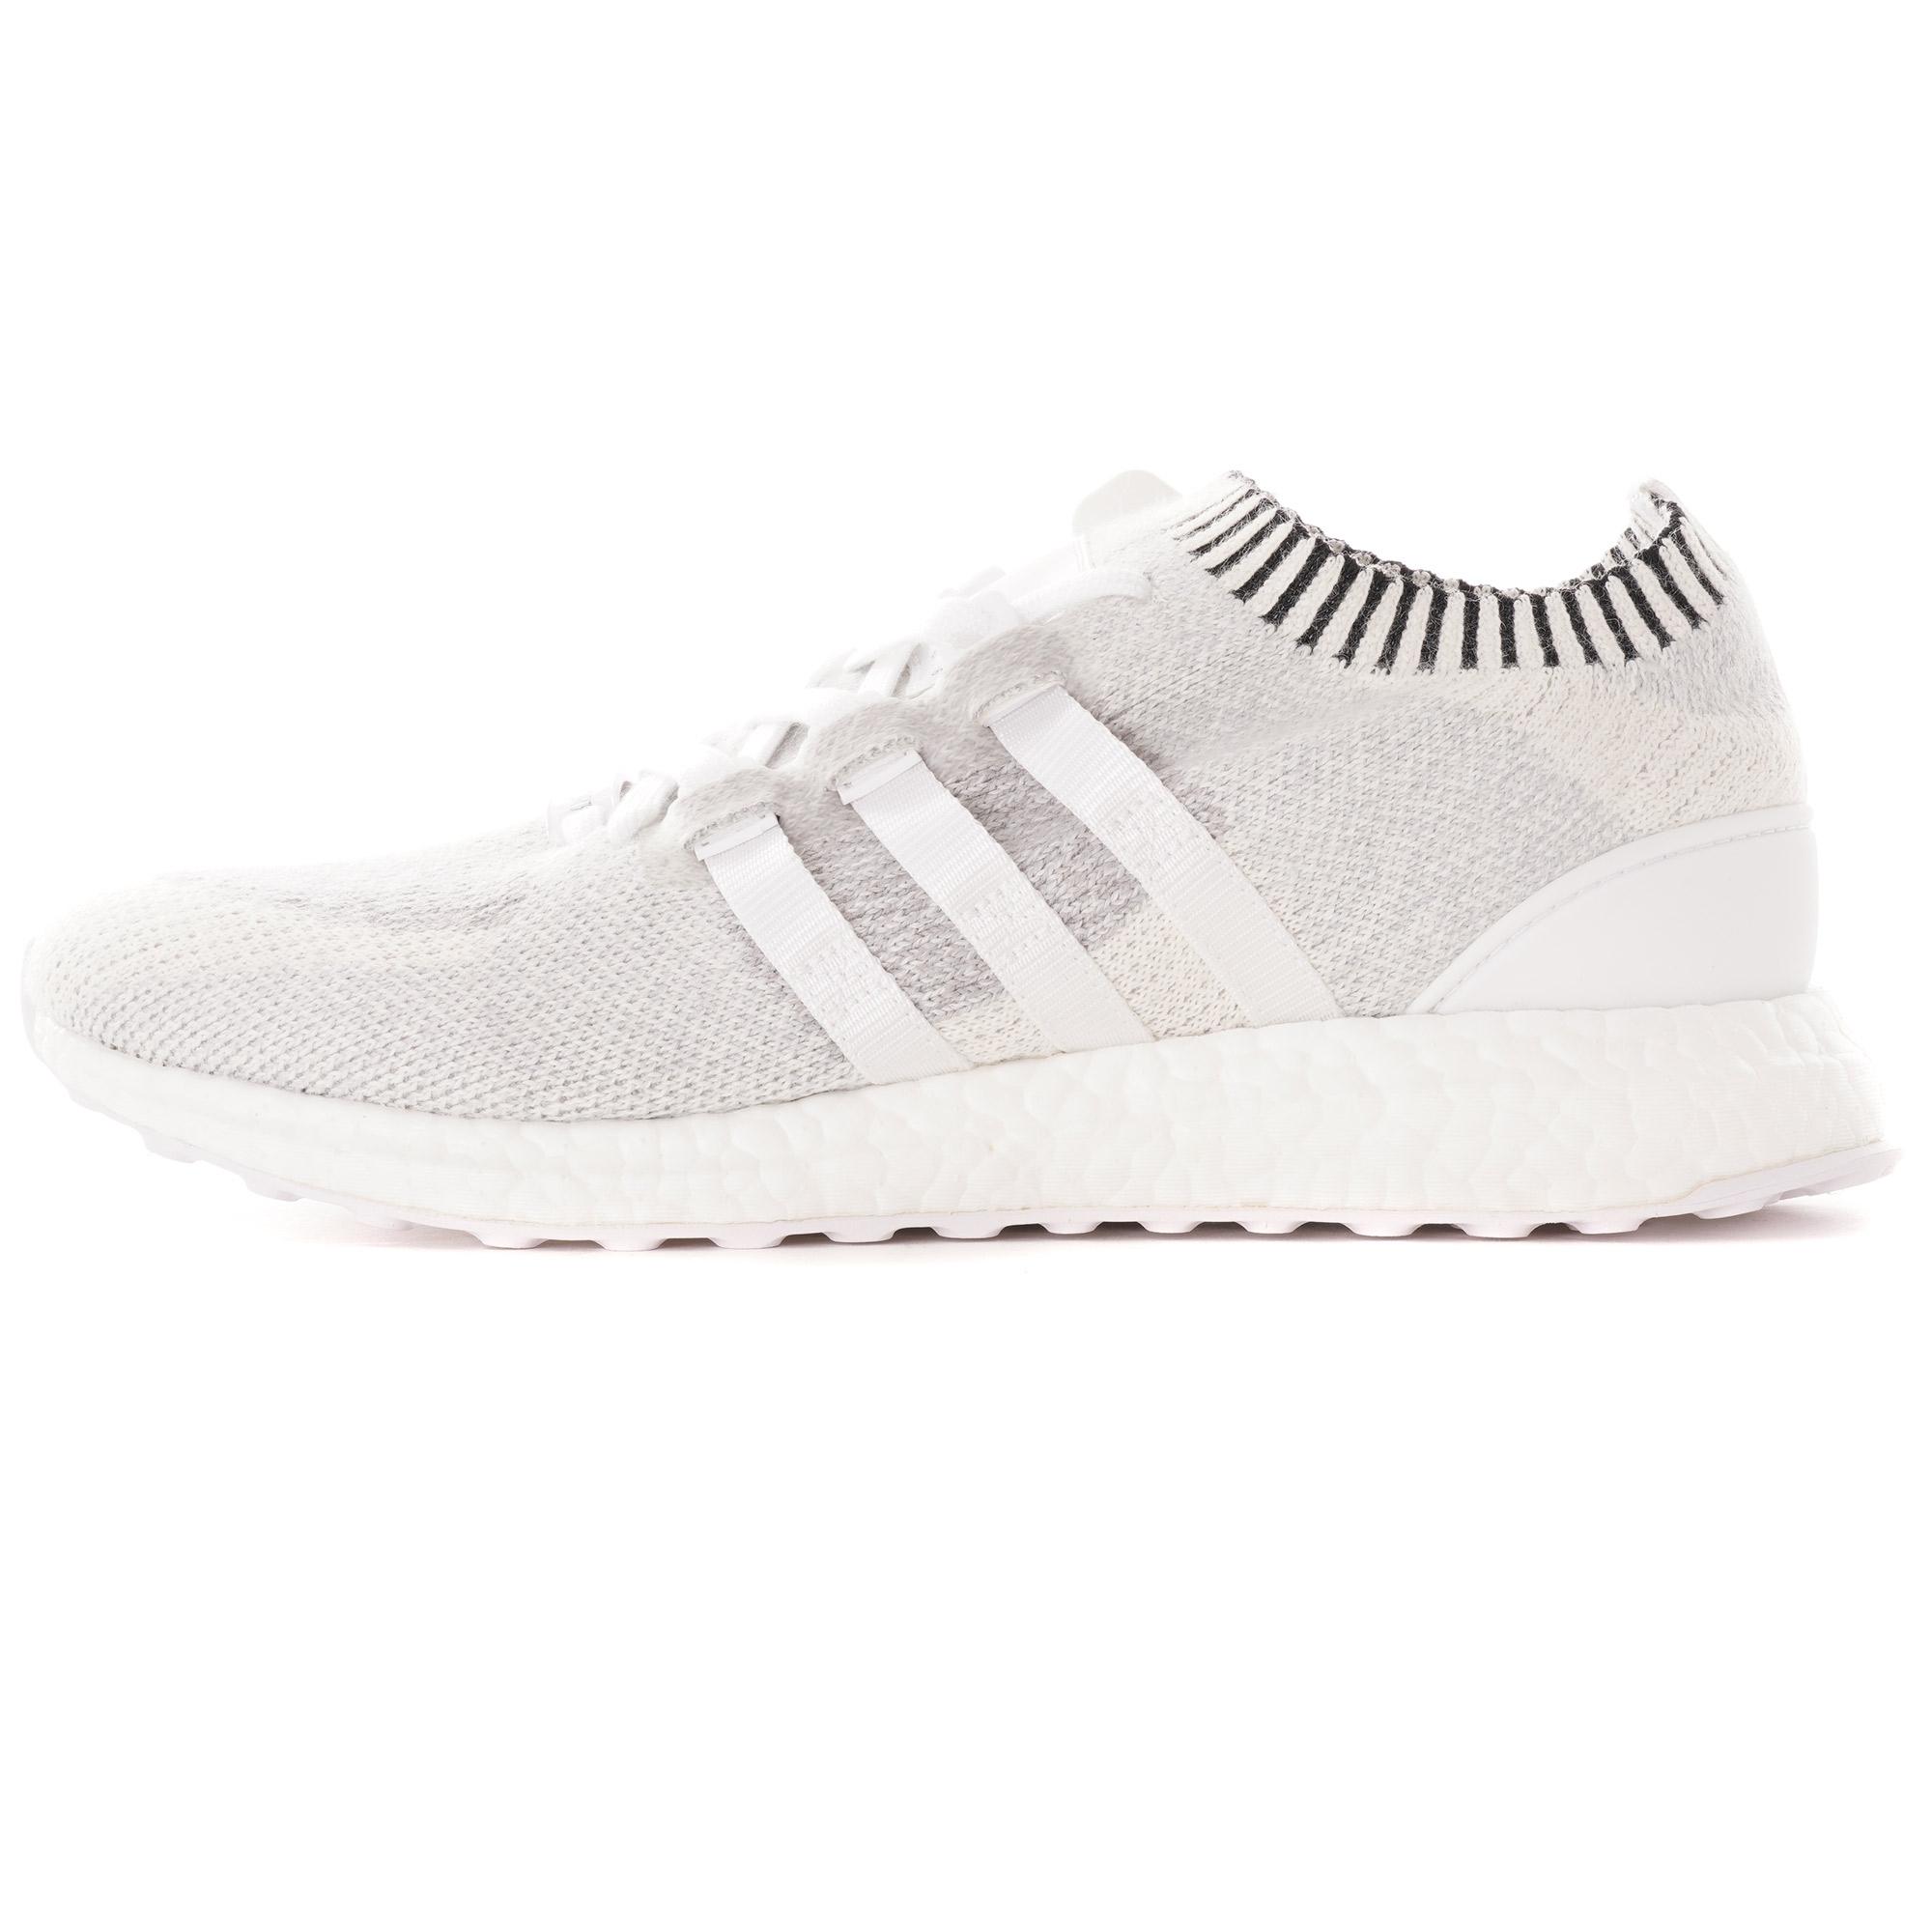 doble tela Hombre rico  Adidas Original EQT Support Ultra PK Shoes | White | AUS Stockists